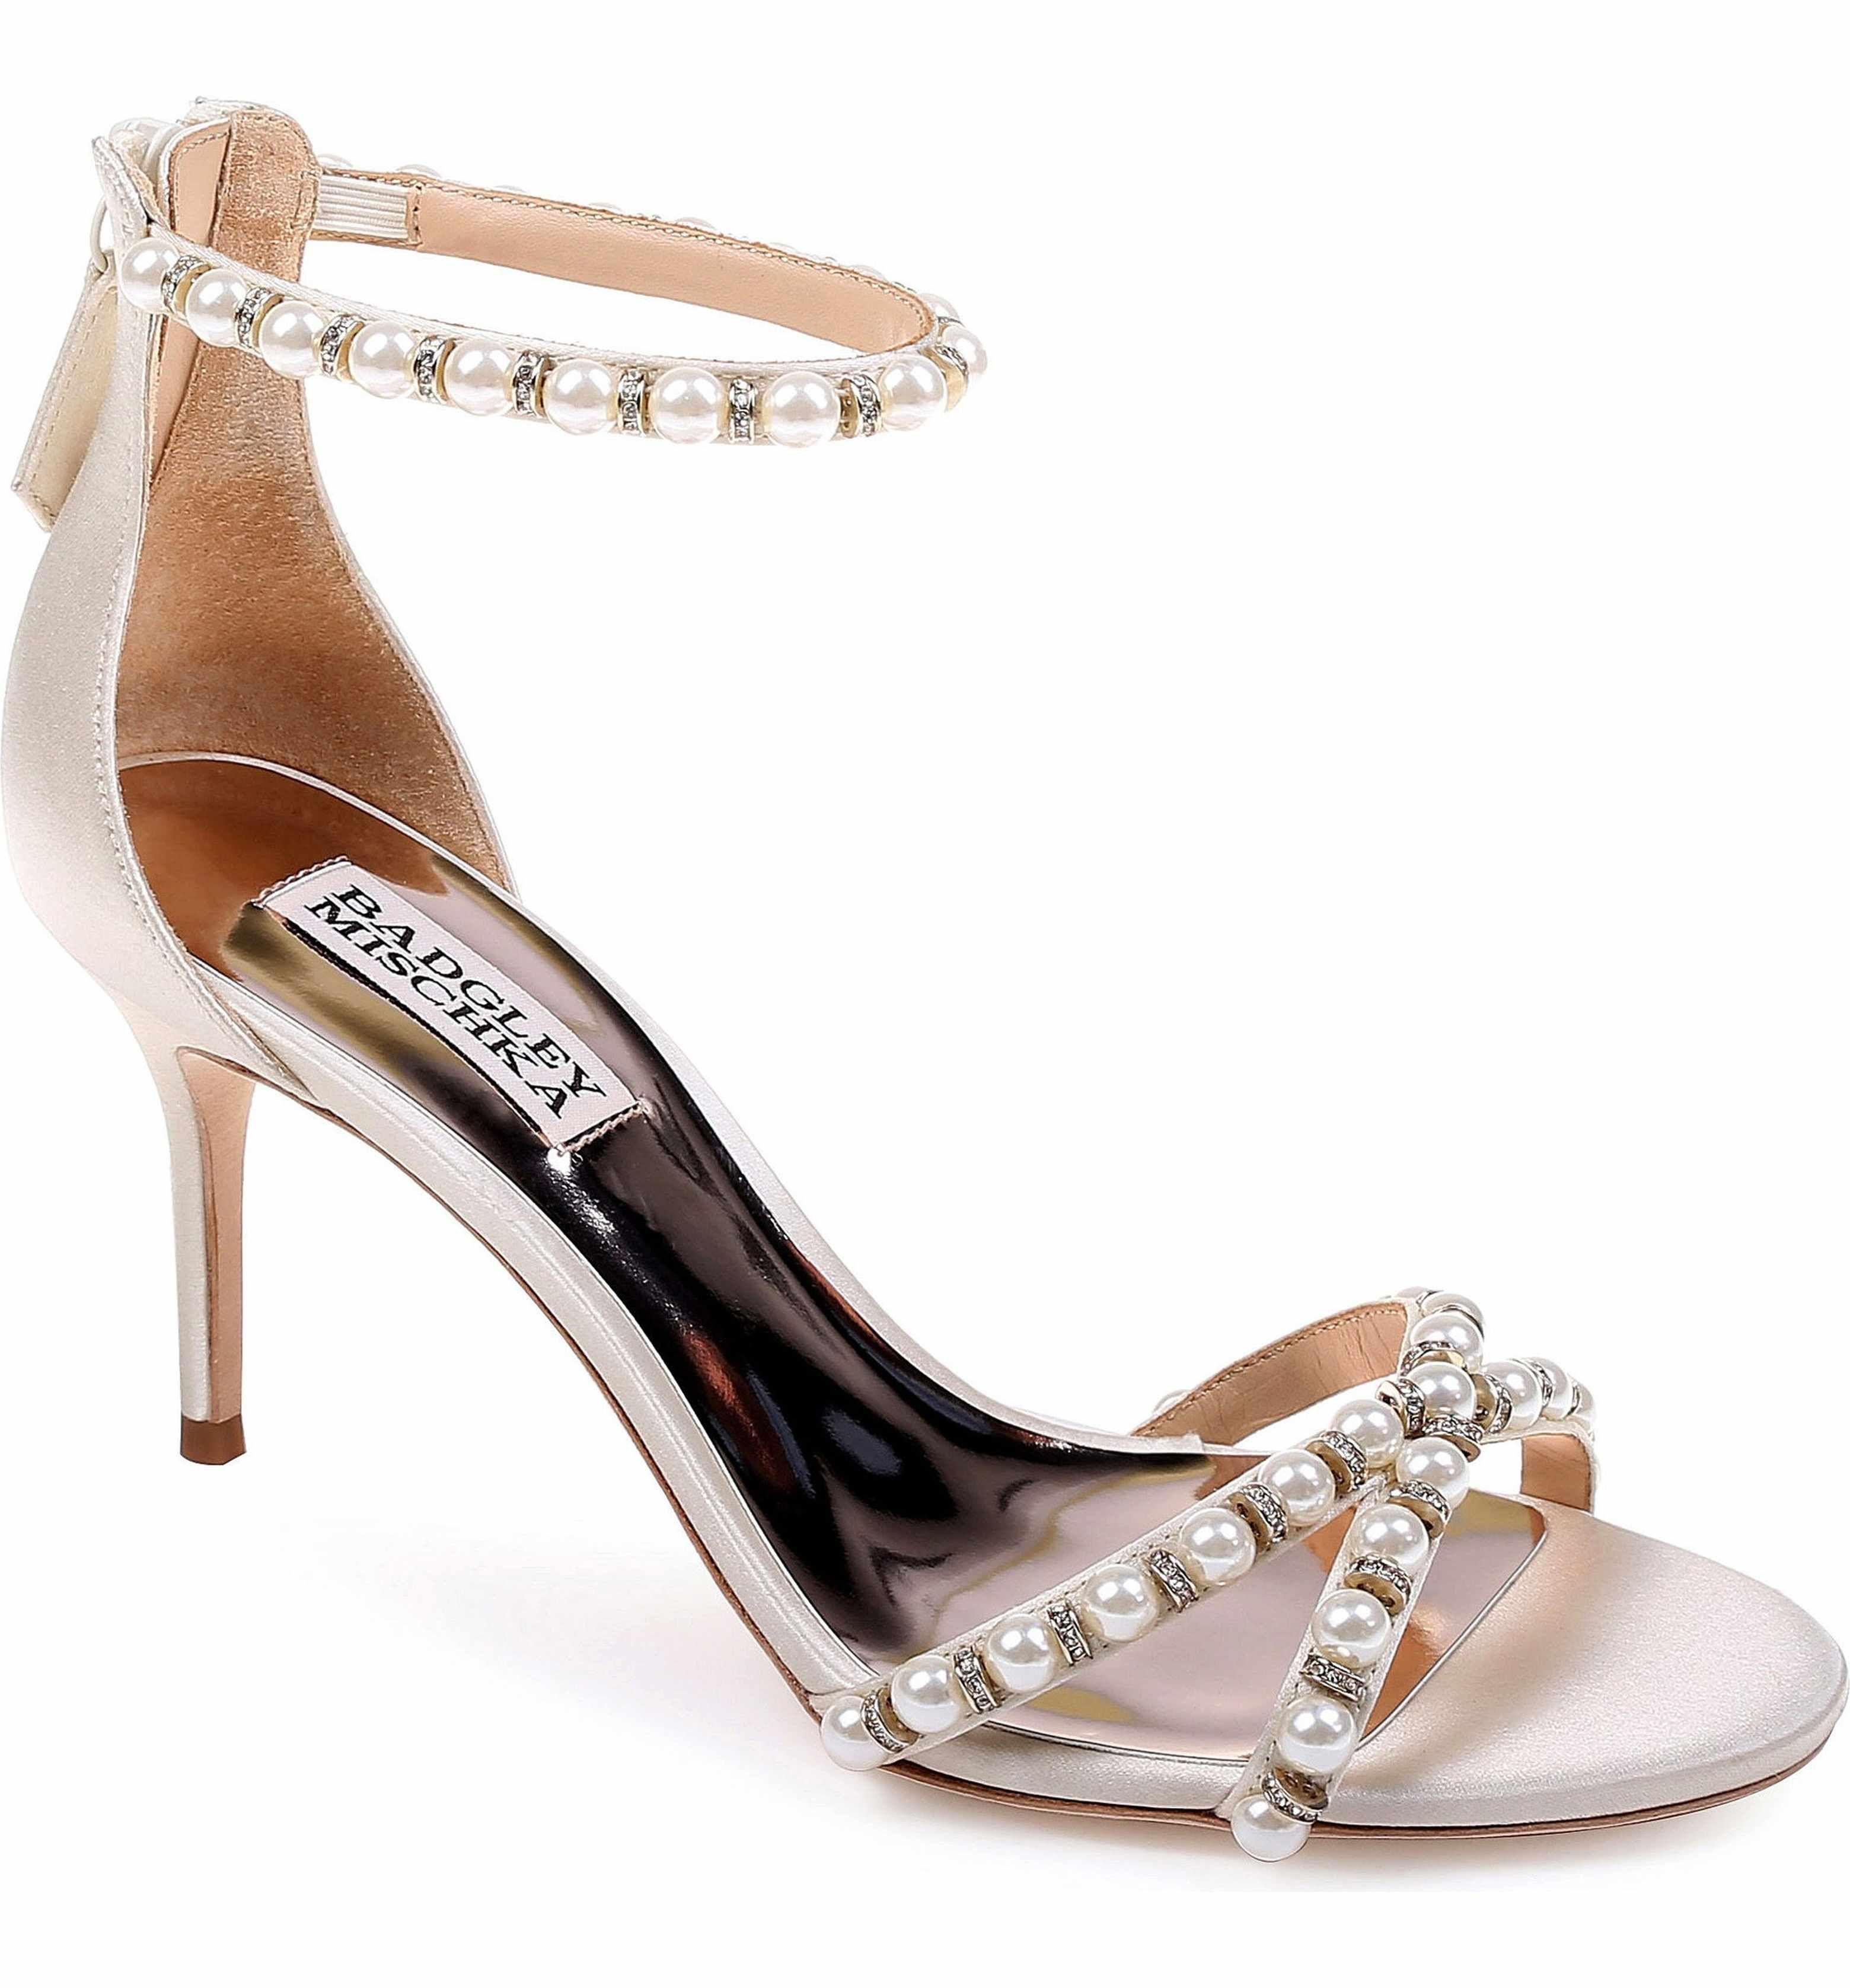 Badgley Mischka Women's Hannah Embellished Ankle Strap Sandal lT5XAjWaw